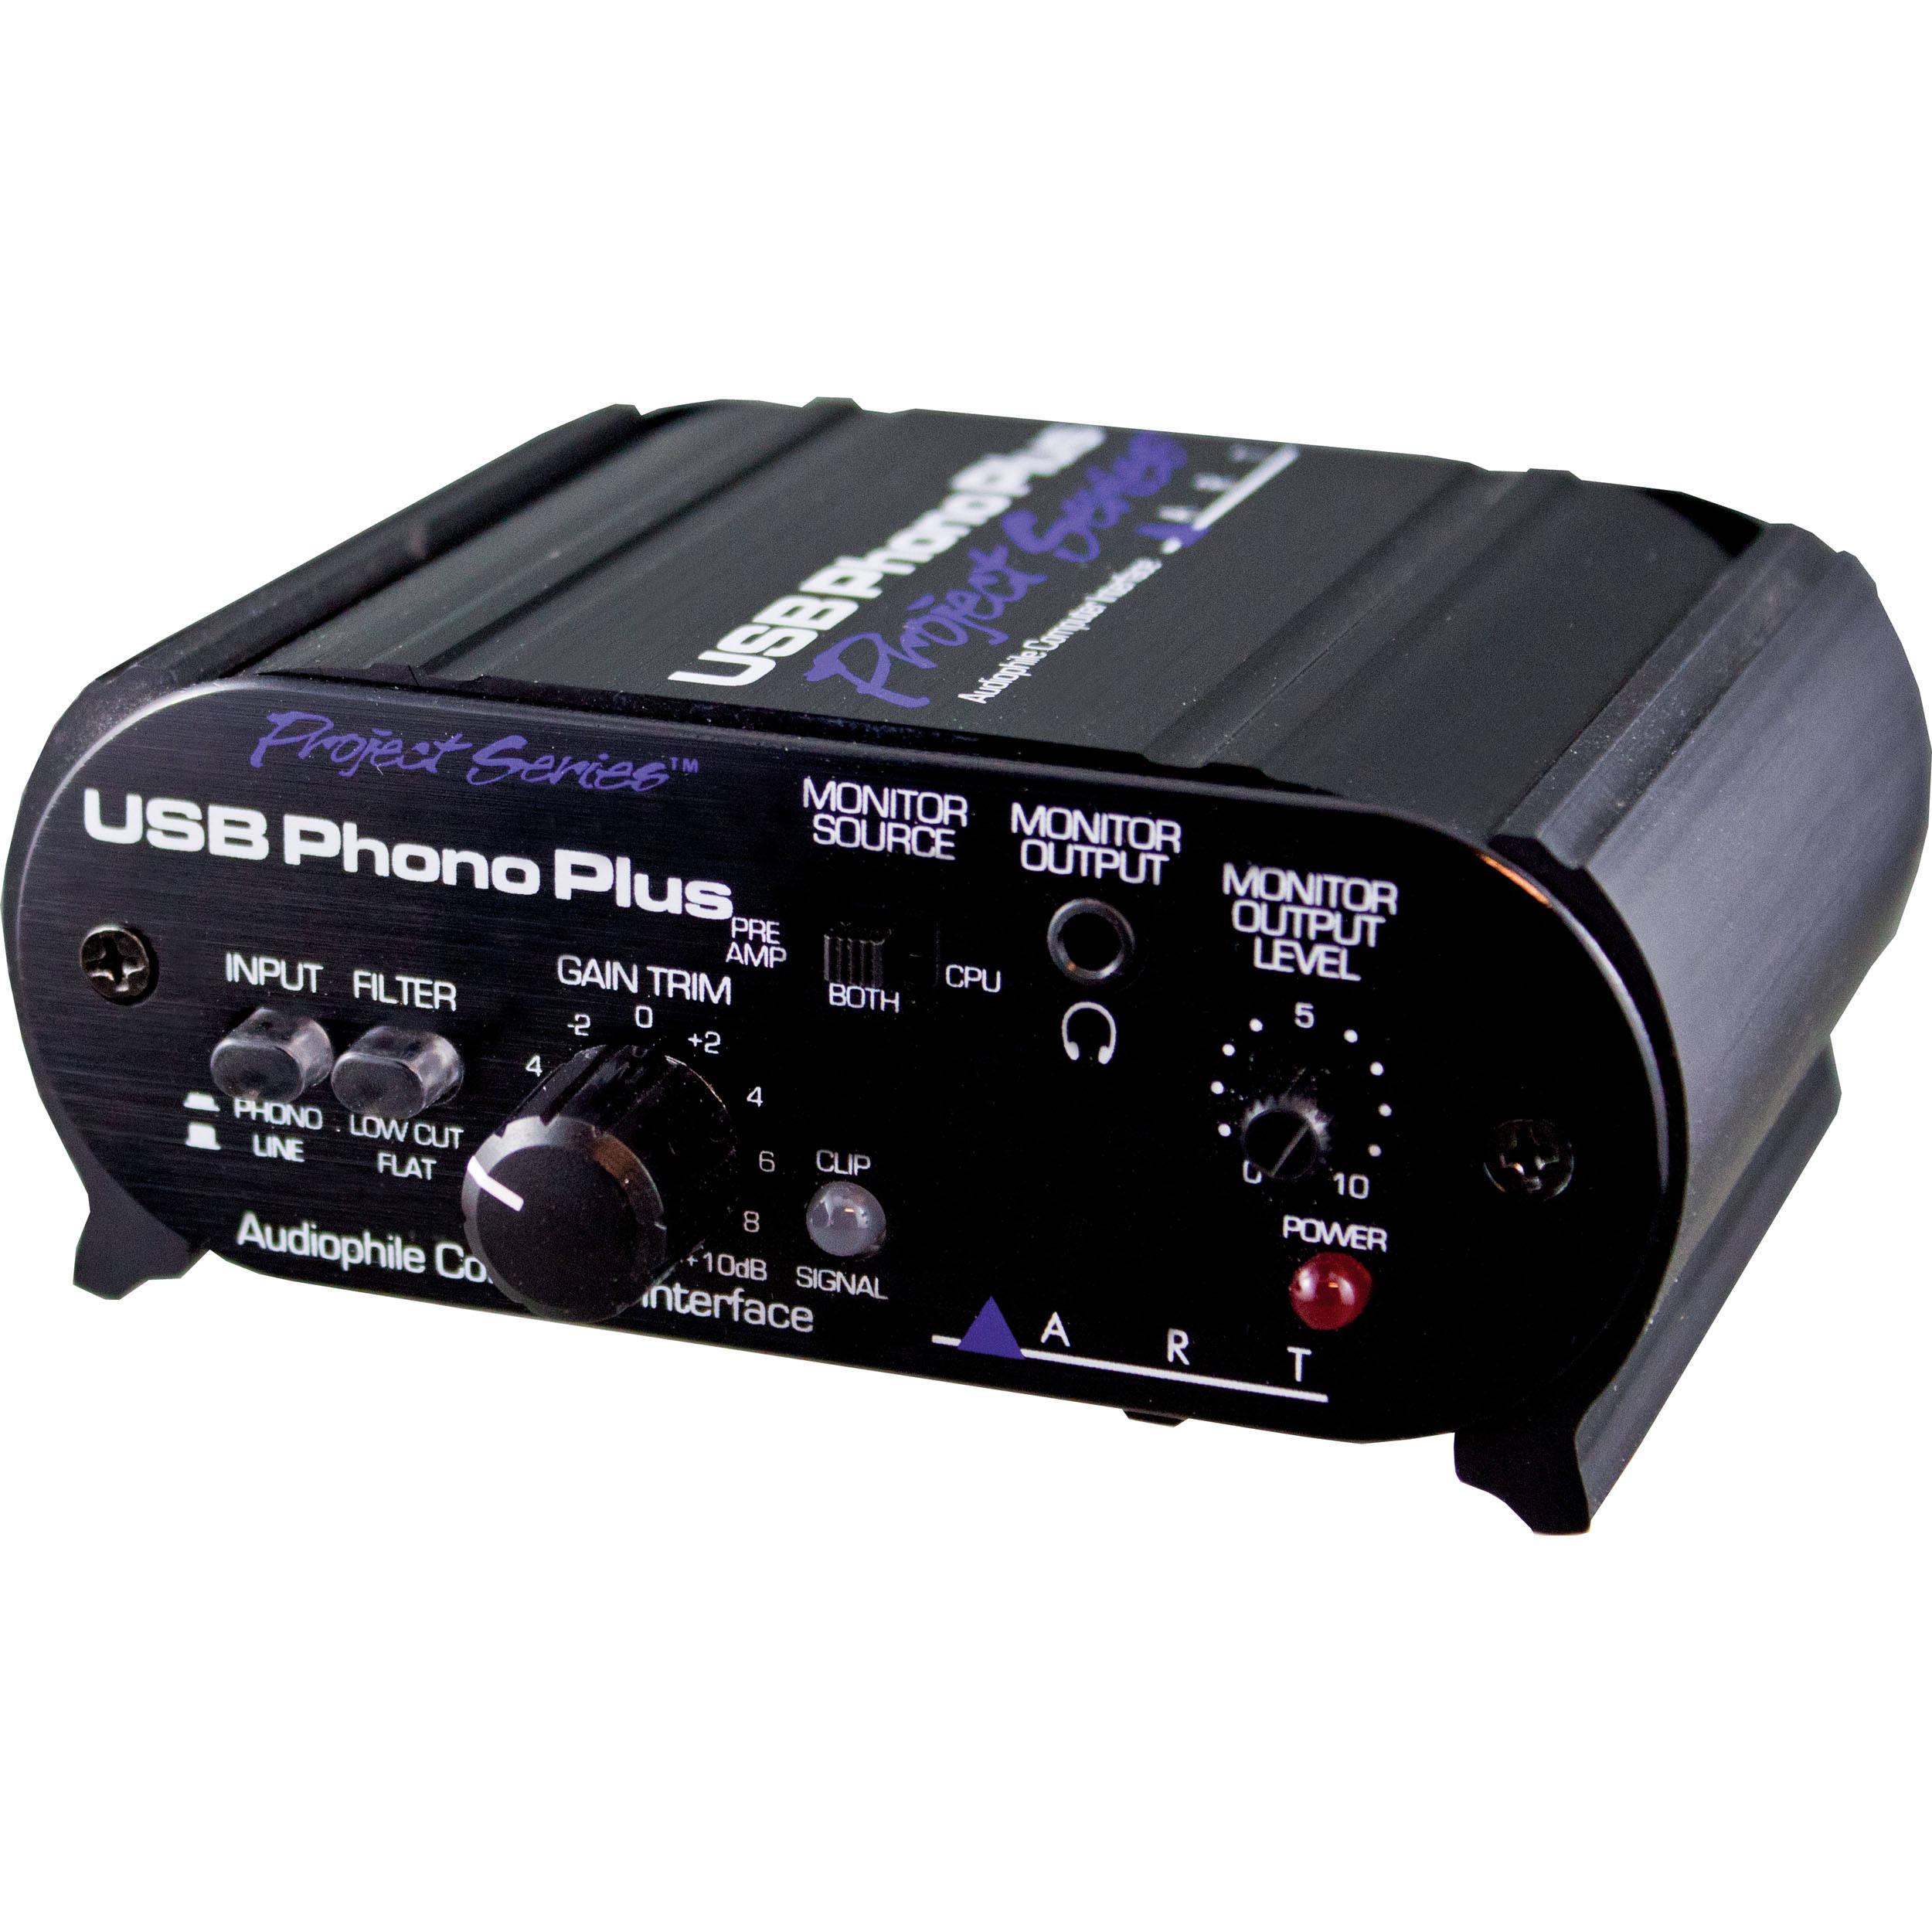 Art Usb Phono Plus Phono Preamp With Usb Usb Phonoplusps B Amp H